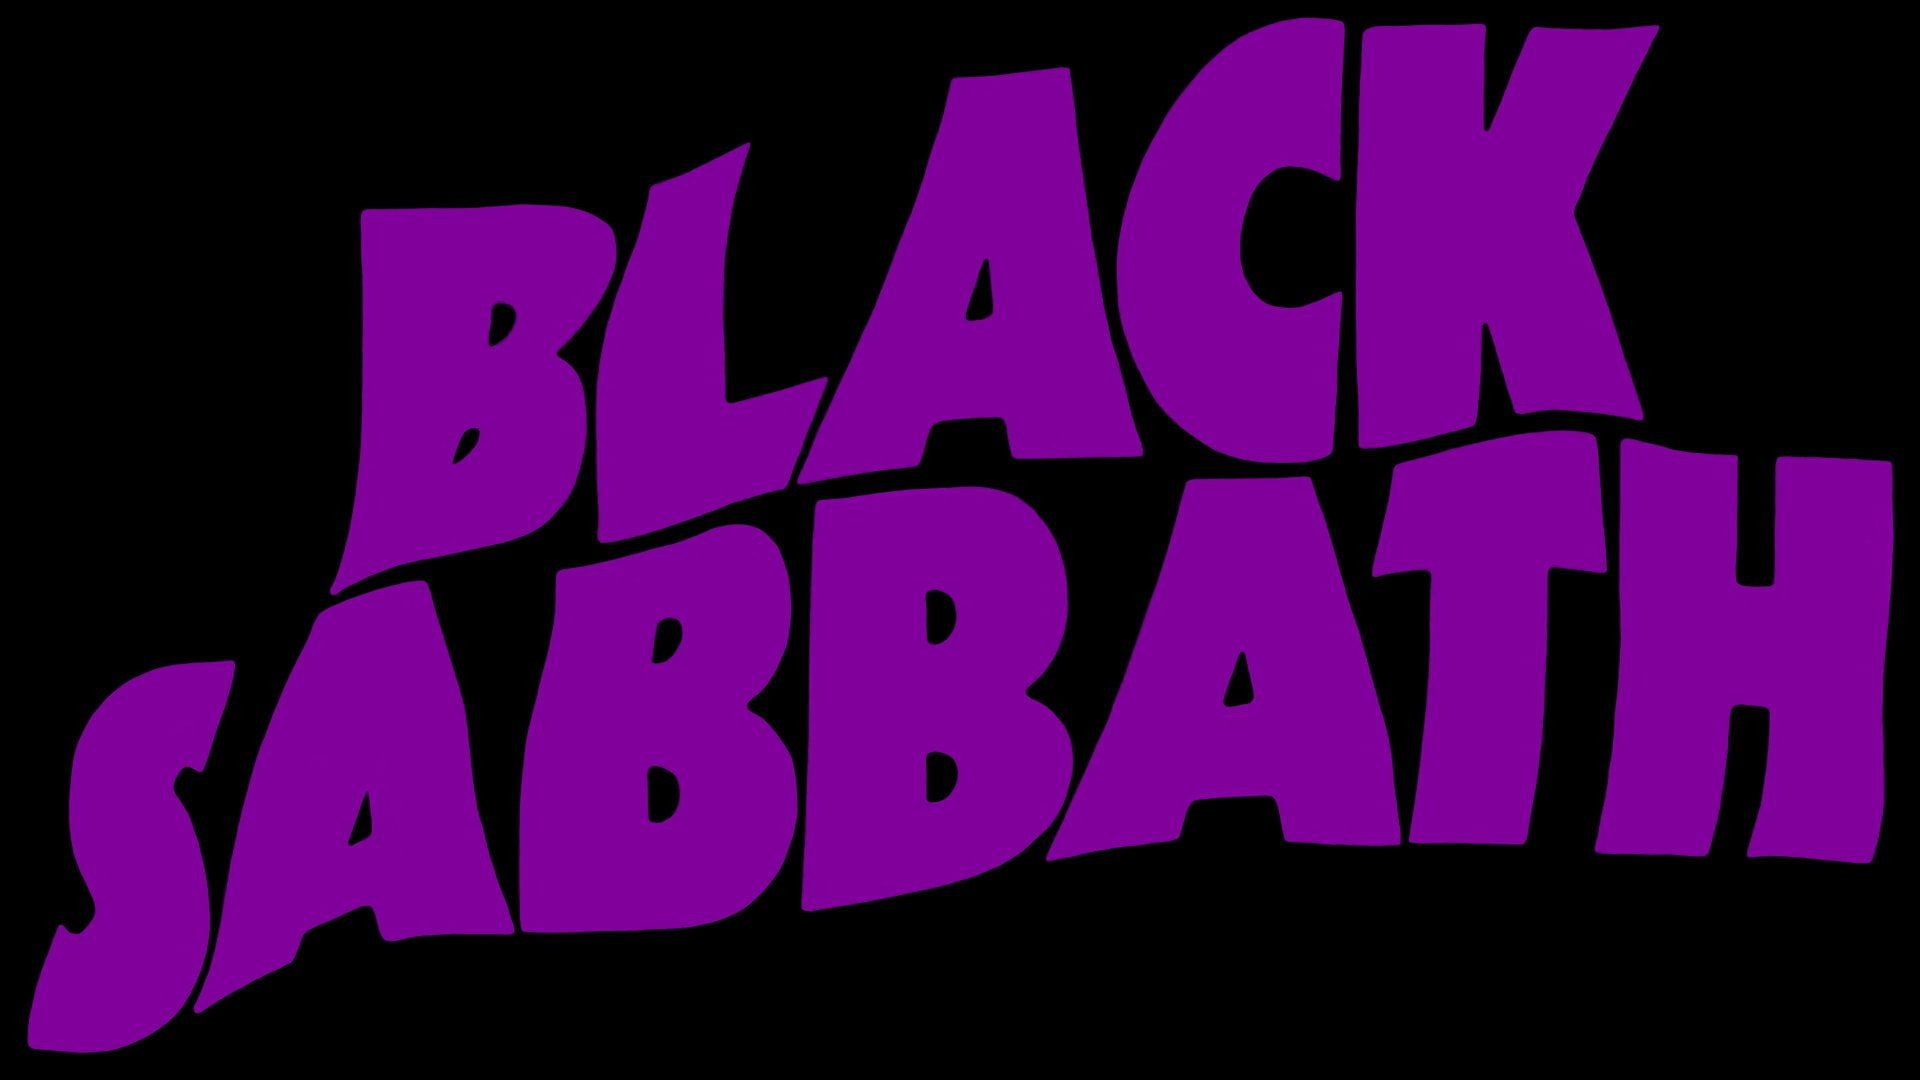 Band Music Black Sabbath Classic Metal Doom Metal Heavy Metal Metal Music 1080p Wallpaper Hdwallpaper De Black Sabbath Classic Metal Burzum Black Metal